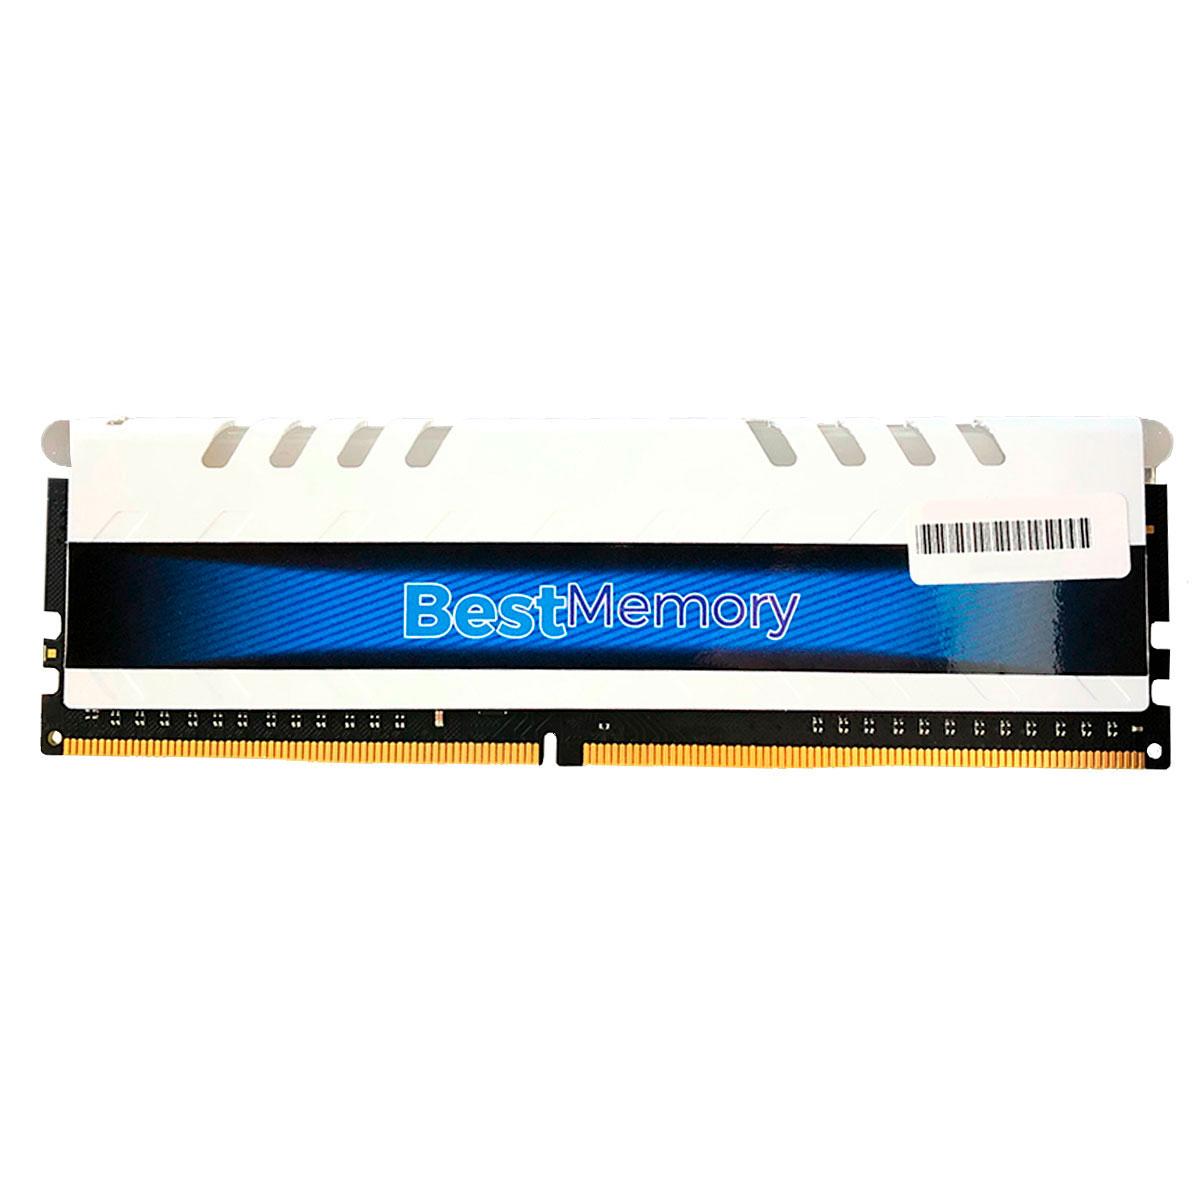 Memória Gamer 16GB Best Memory Highlander RGB, DDR4, 3000MHz, CL15 - BT-D4-16G 3000DW-RGB - Branca